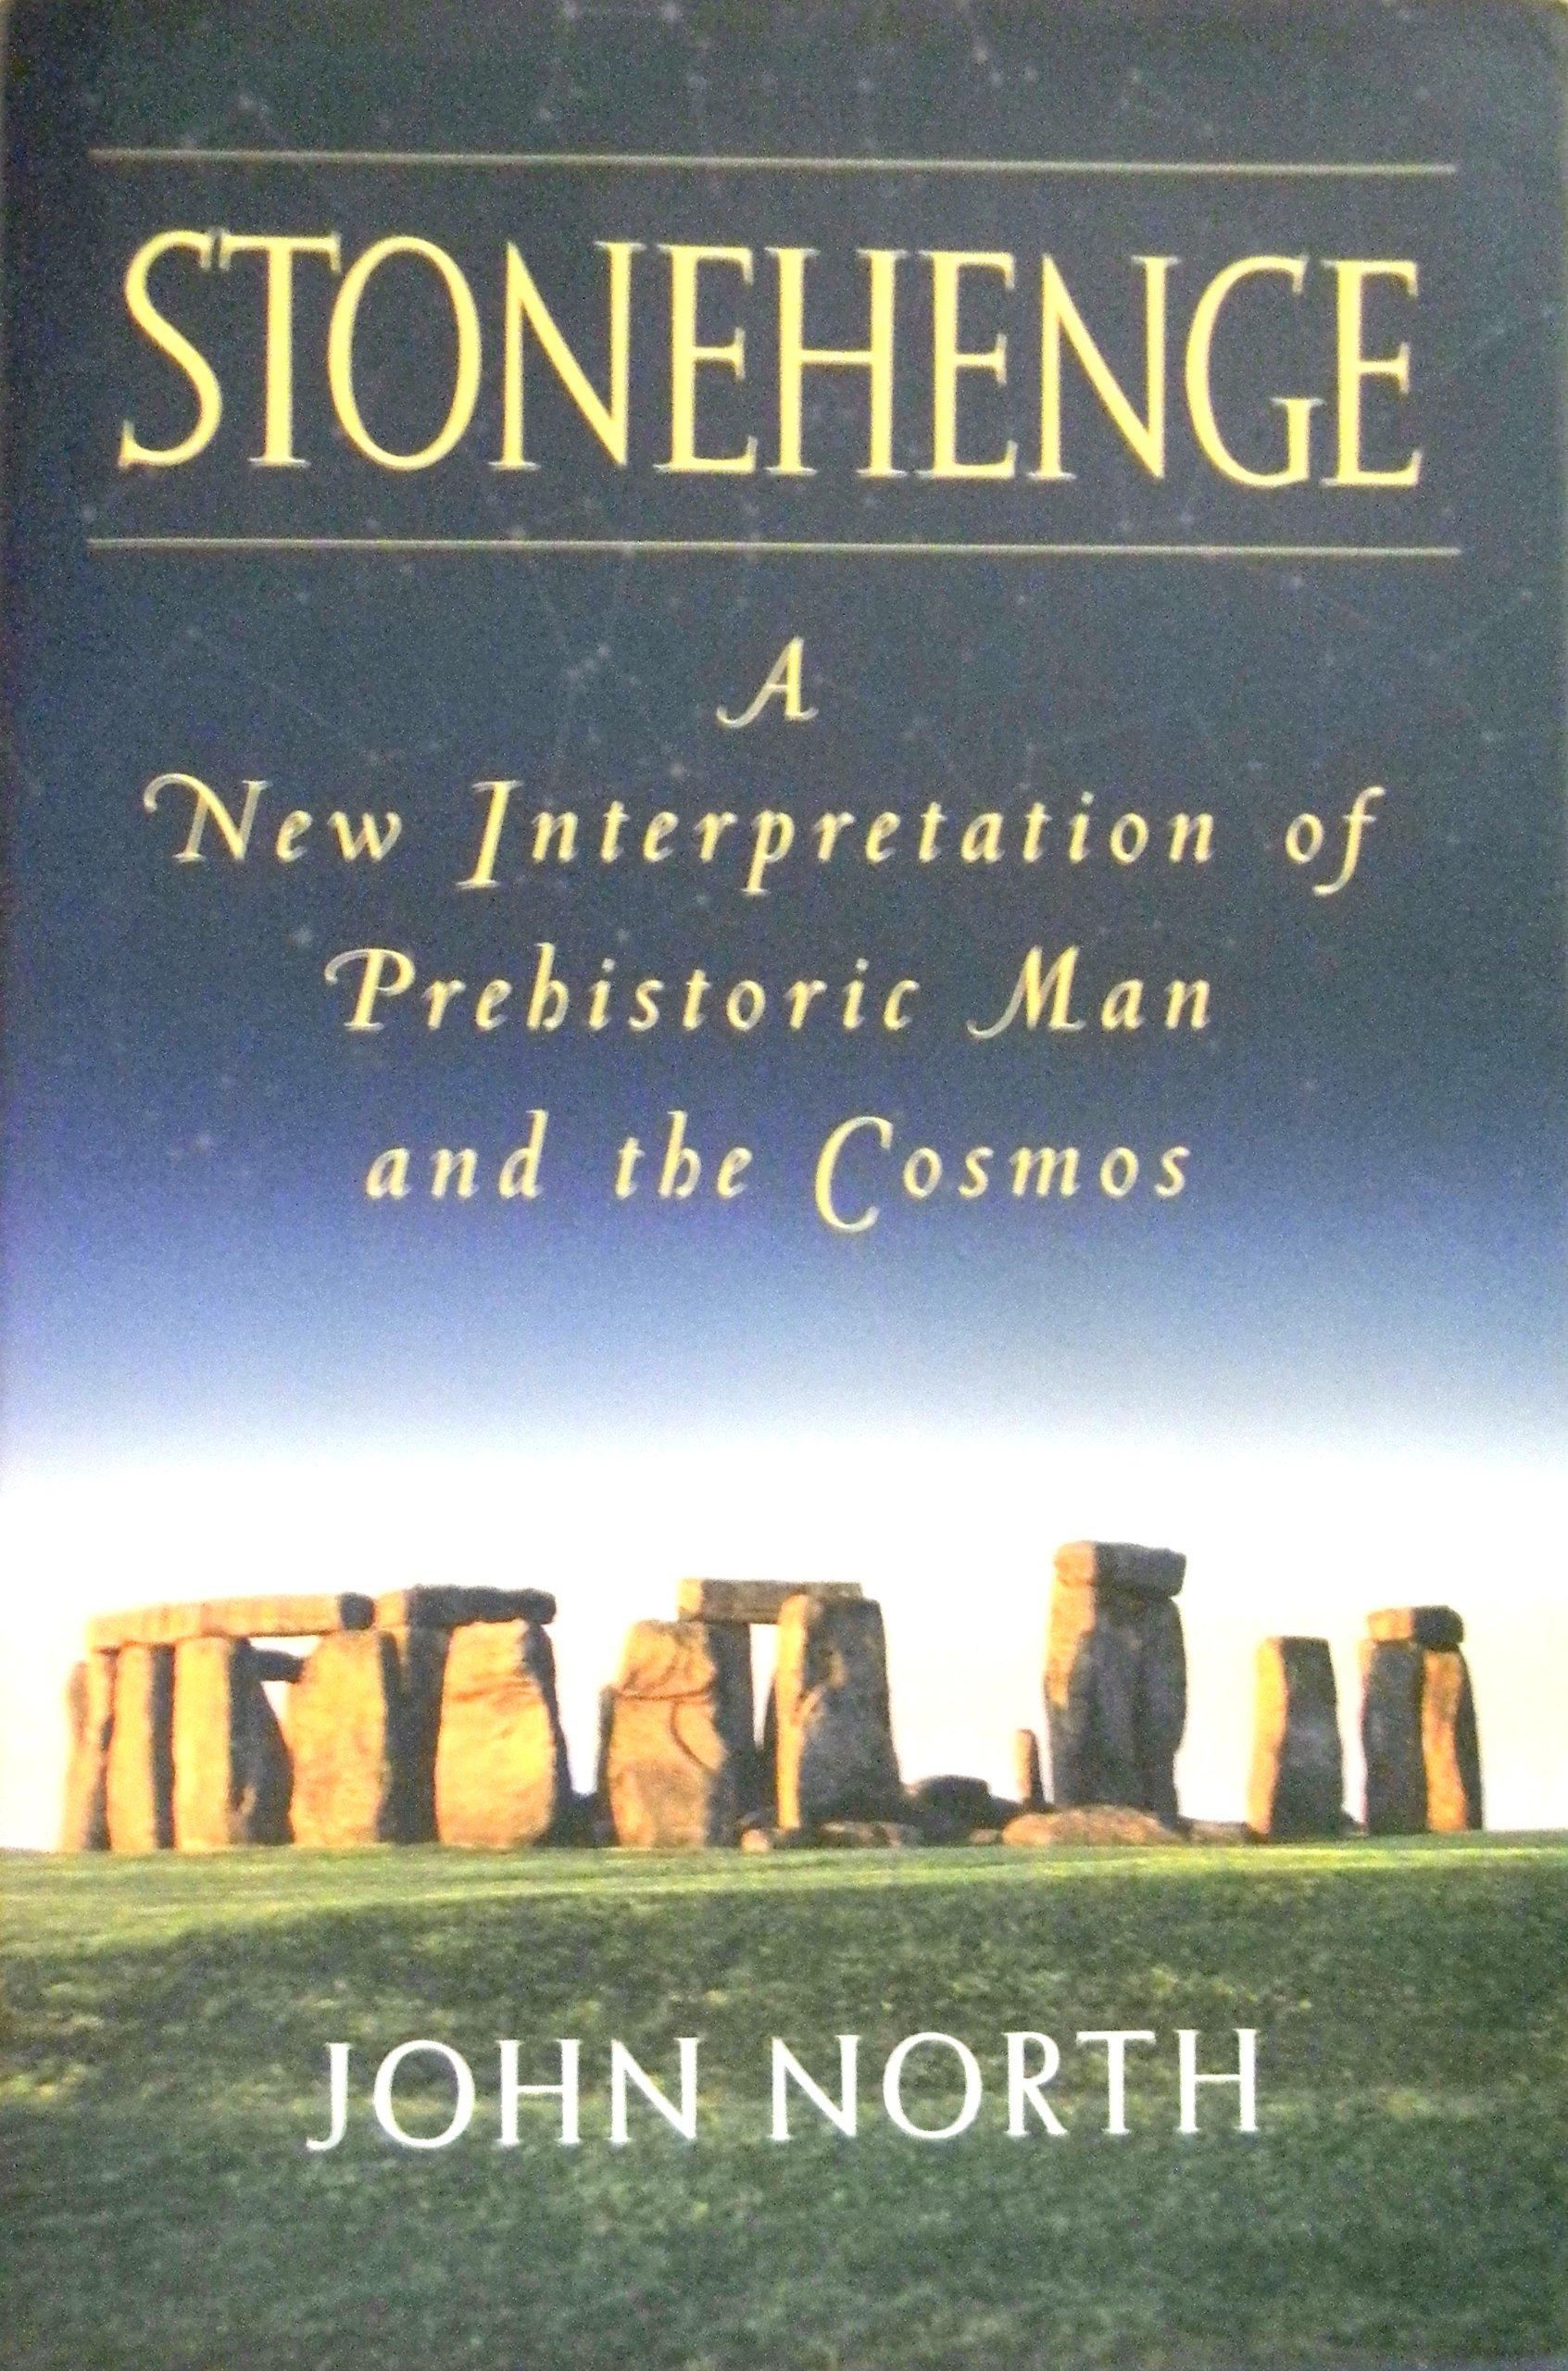 Stonehenge : A New Interpretation of Prehistoric Man and the Cosmos